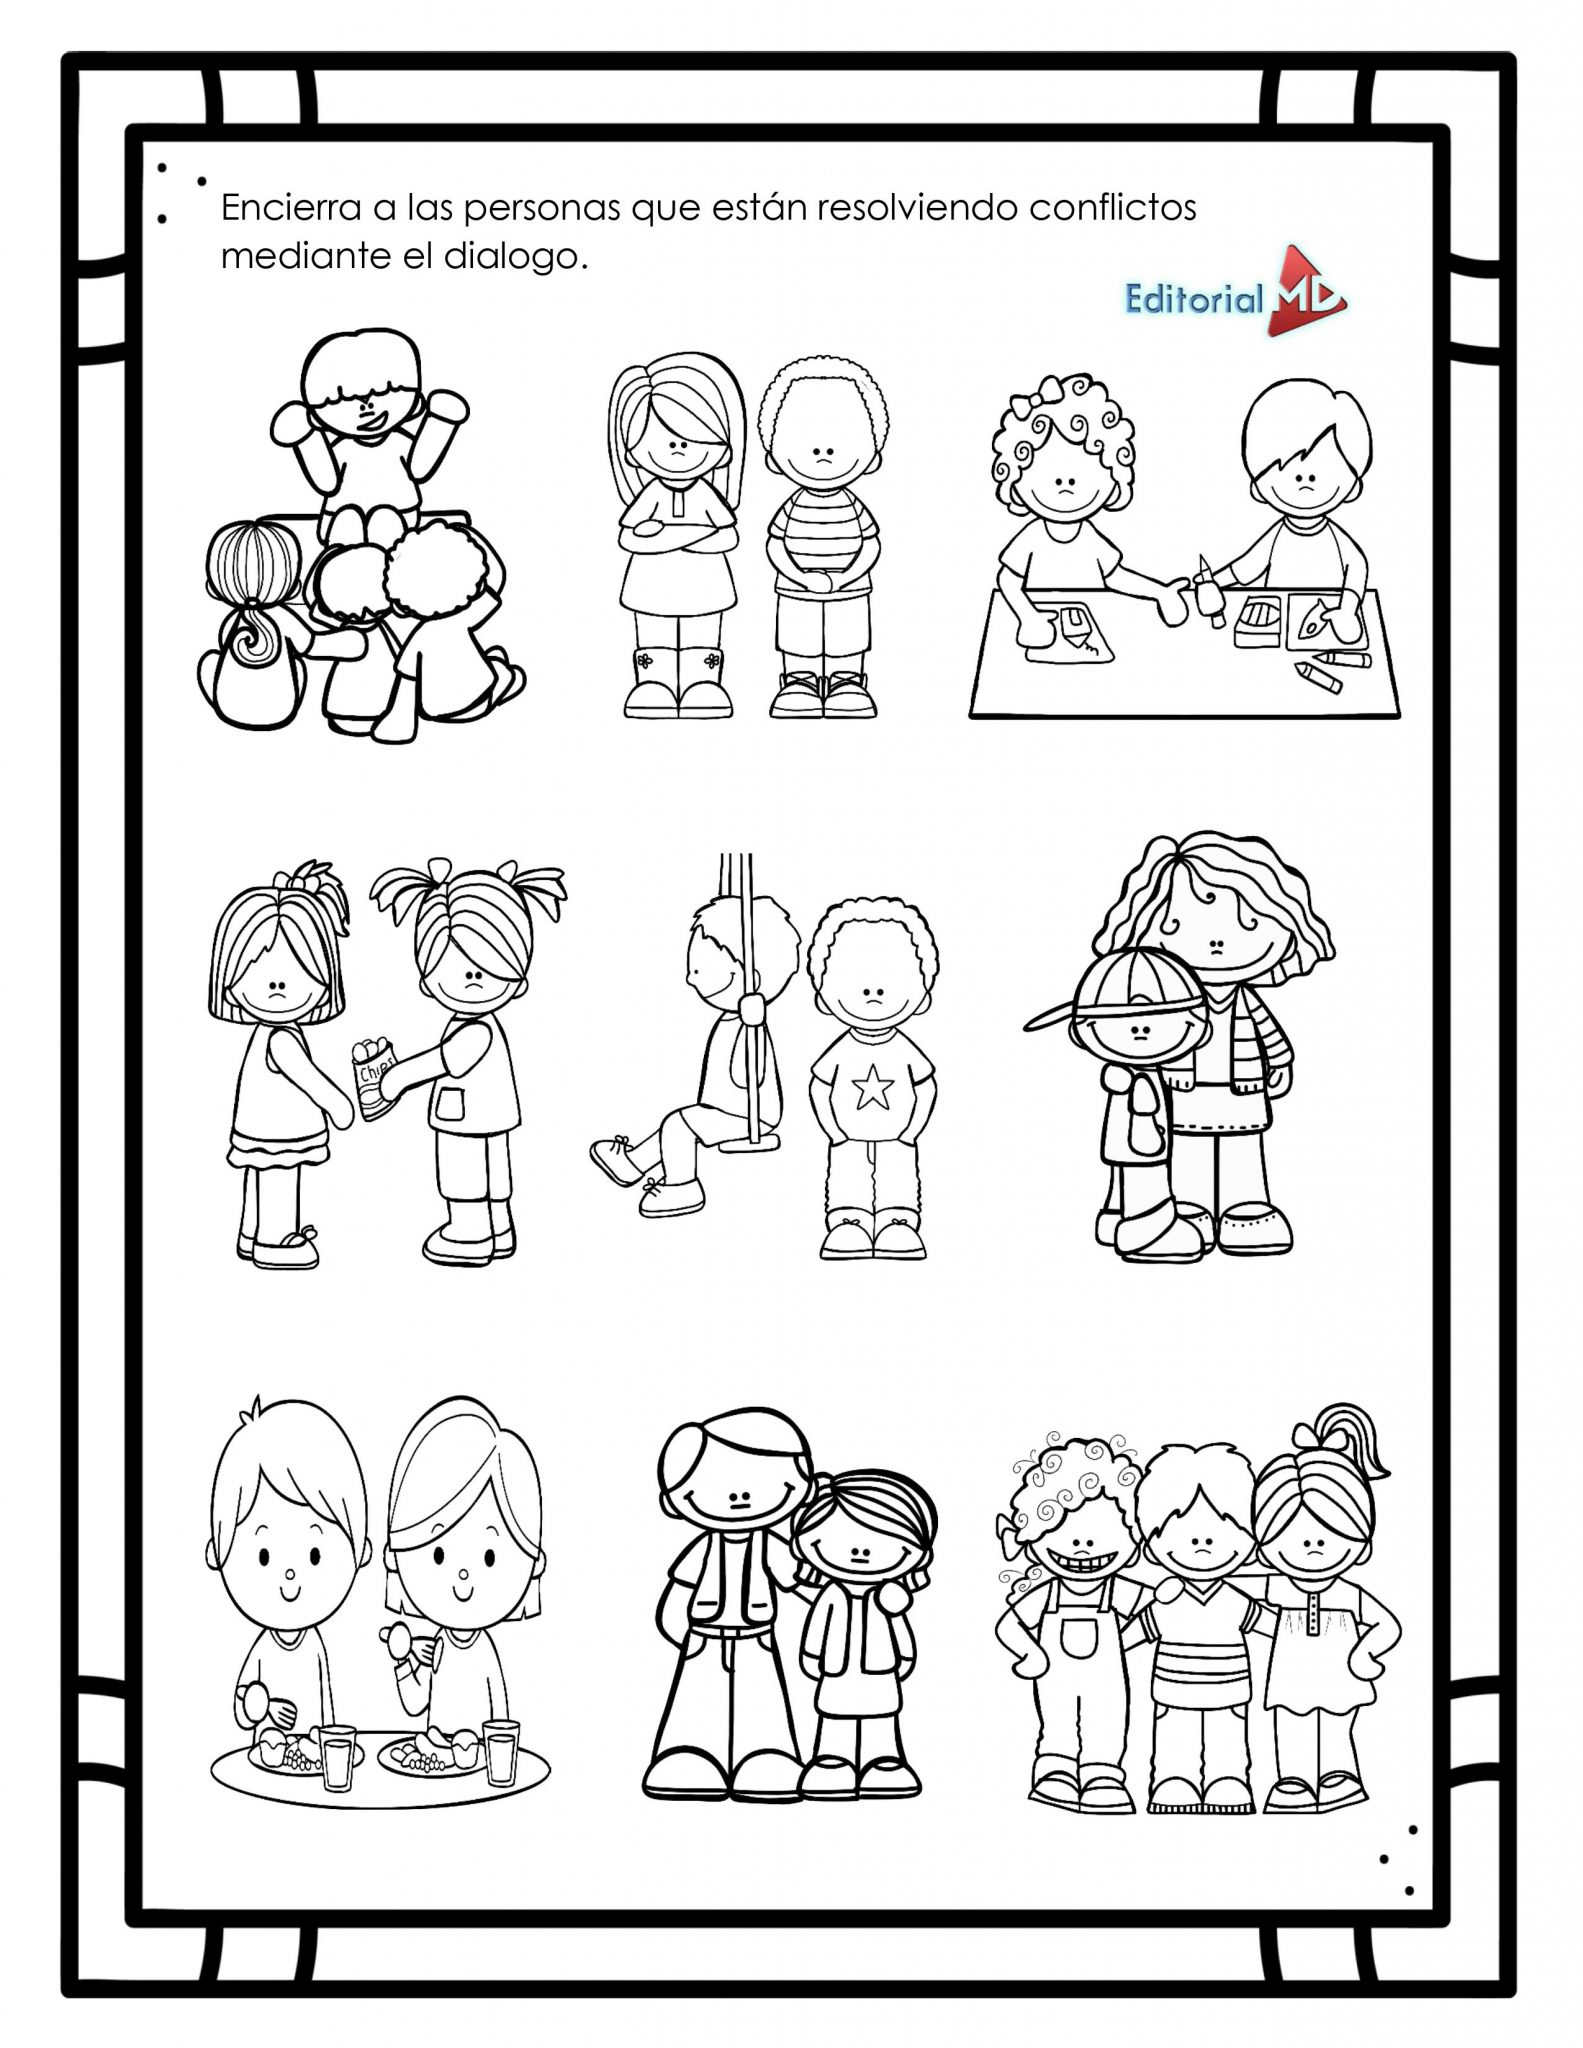 Ejemplo Material de apoyo semana 19 preescolar 02